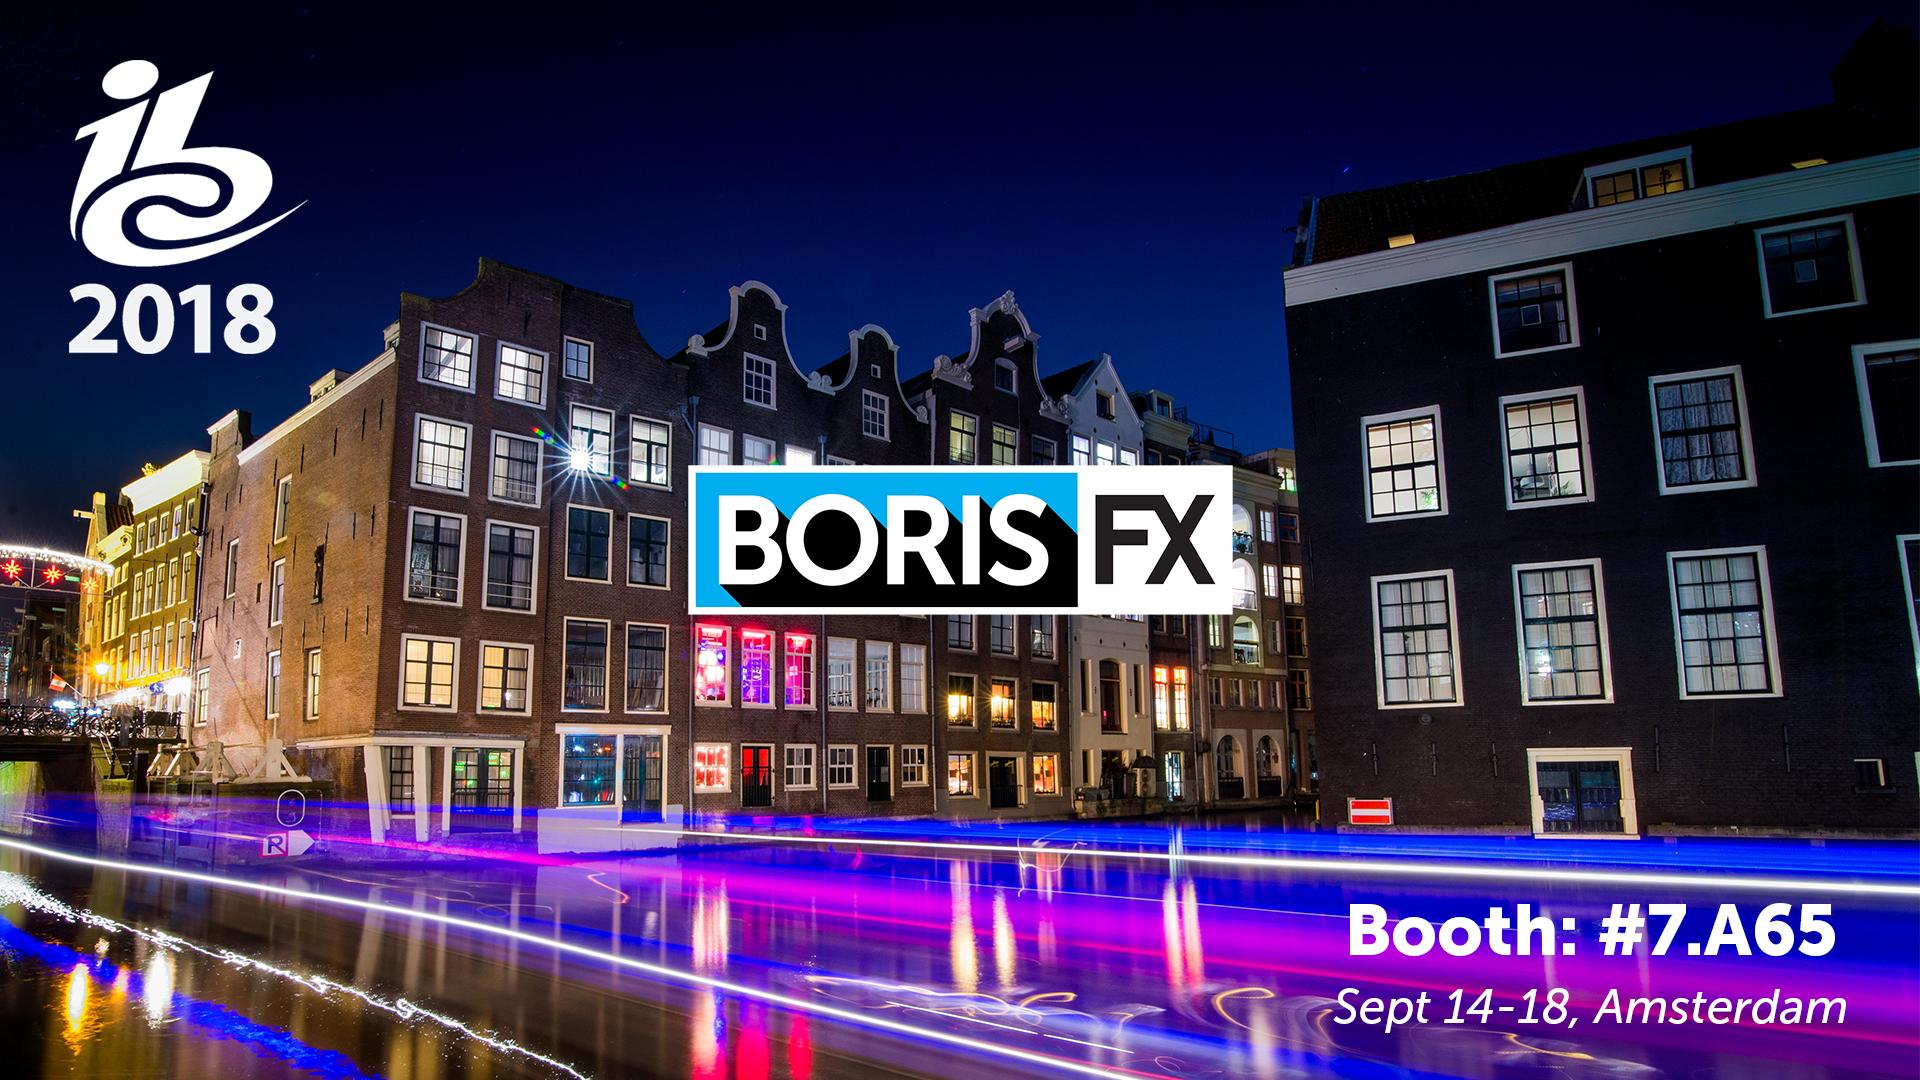 Boris FX IBC 2018 banner